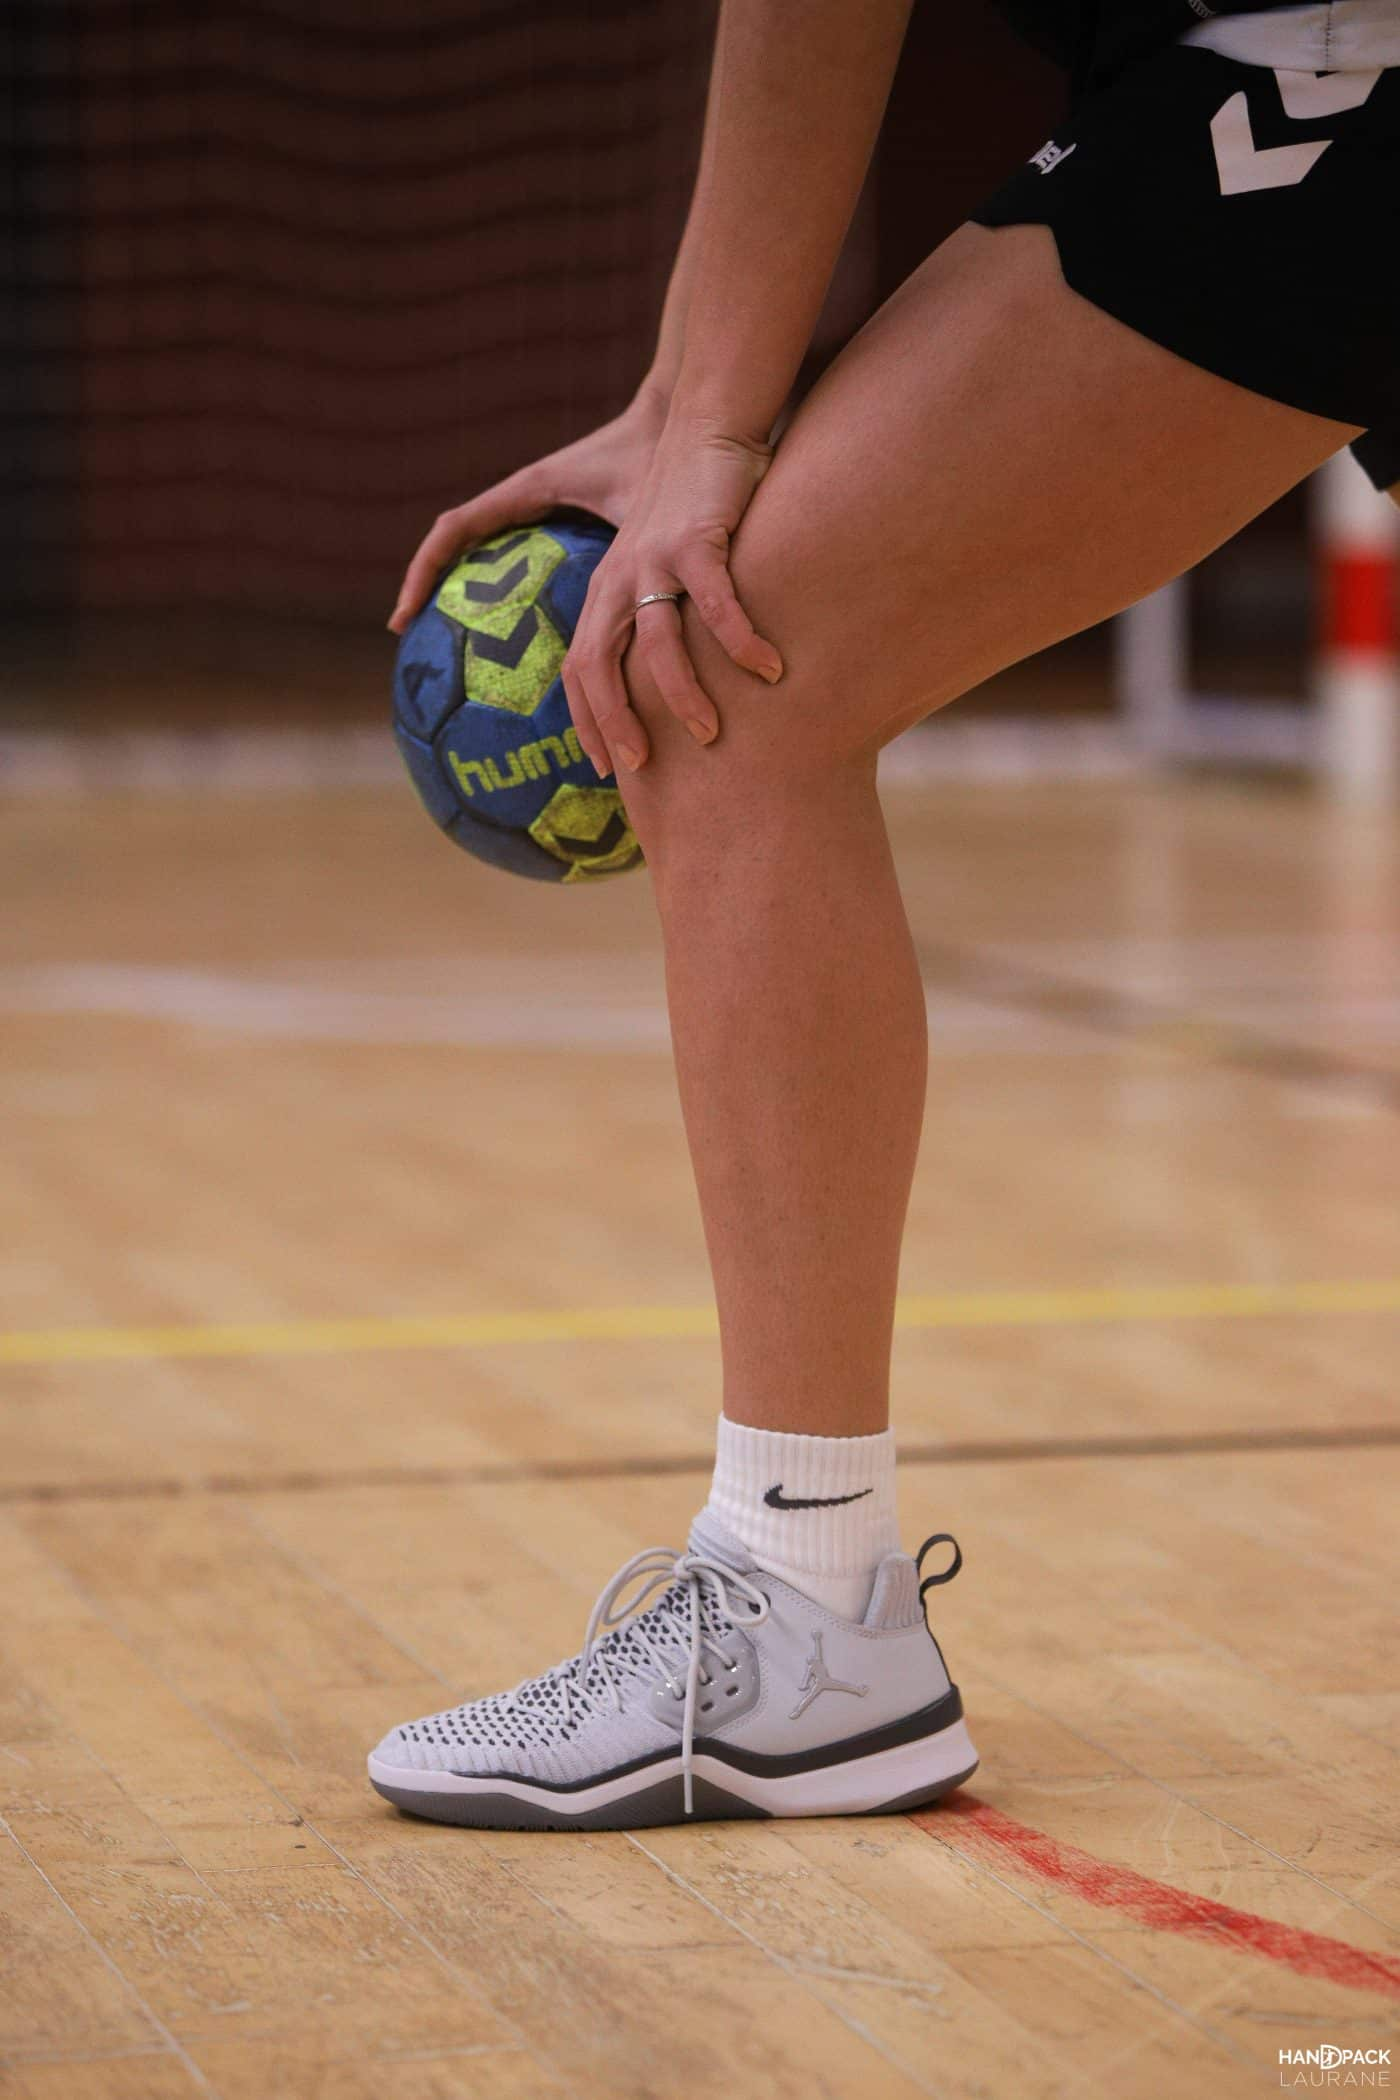 test-chaussures-jordan-dna-lx-handpack-2